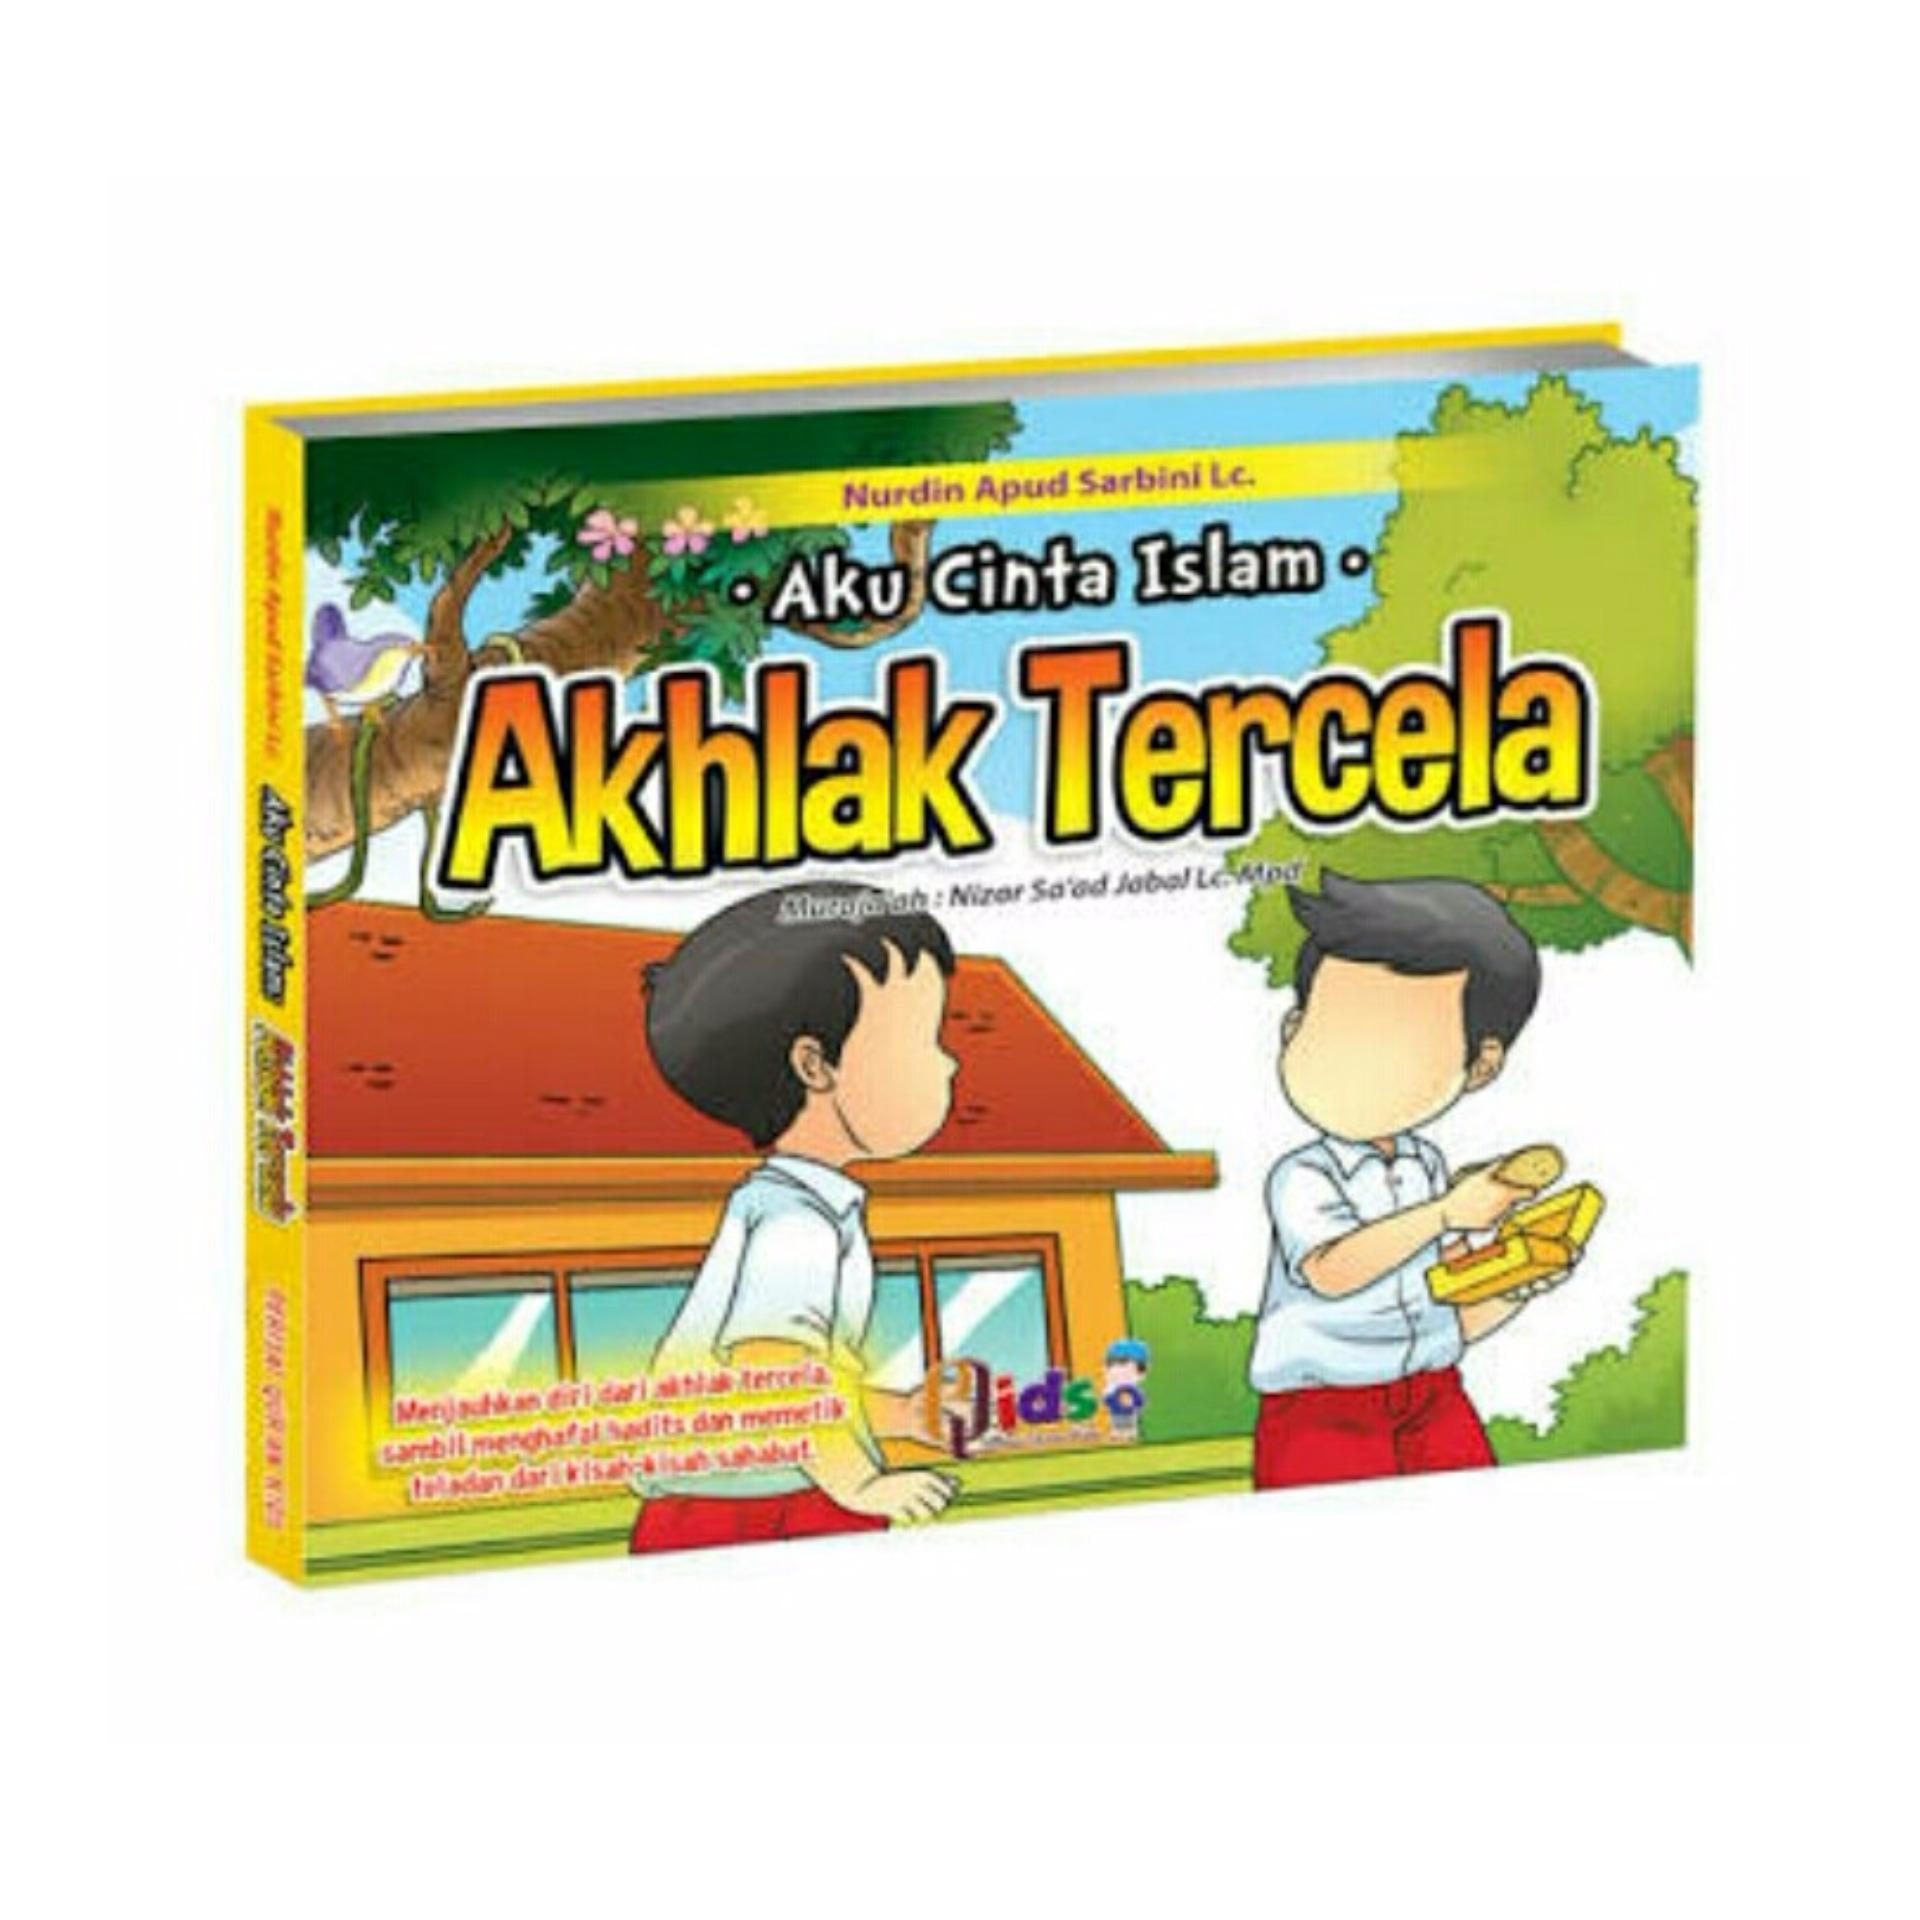 Buku Anak; Buku Anak; Buku Anak .